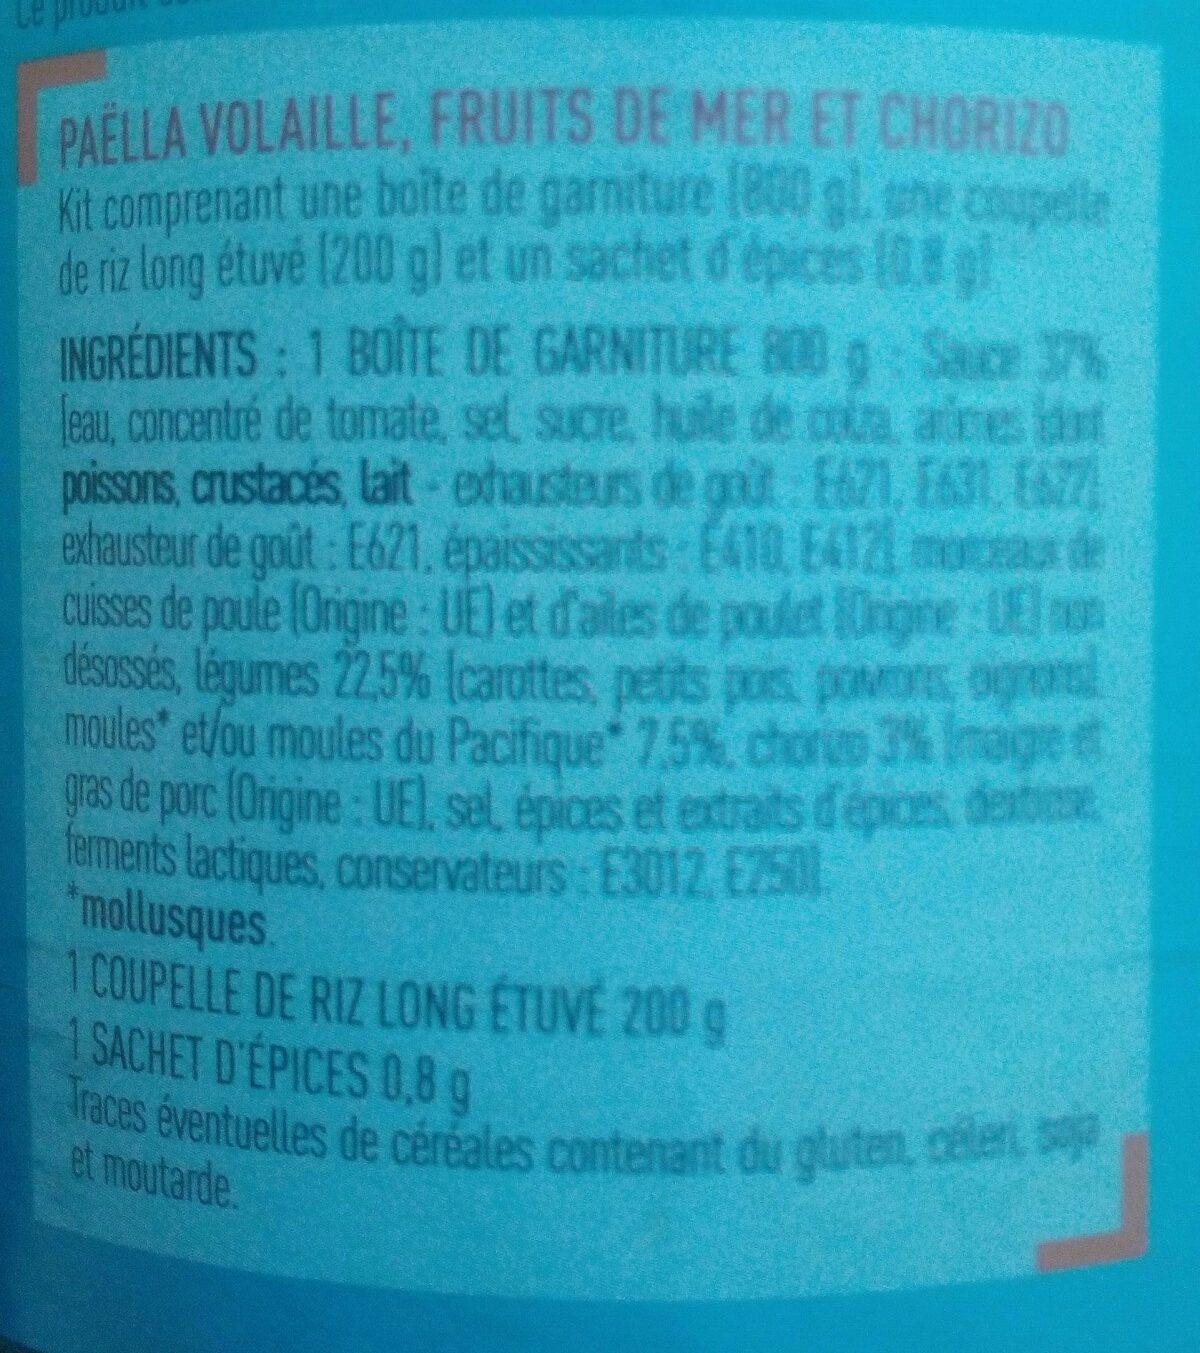 Paëlla (Volaille, Fruits de mer et Chorizo) - Ingrediënten - fr